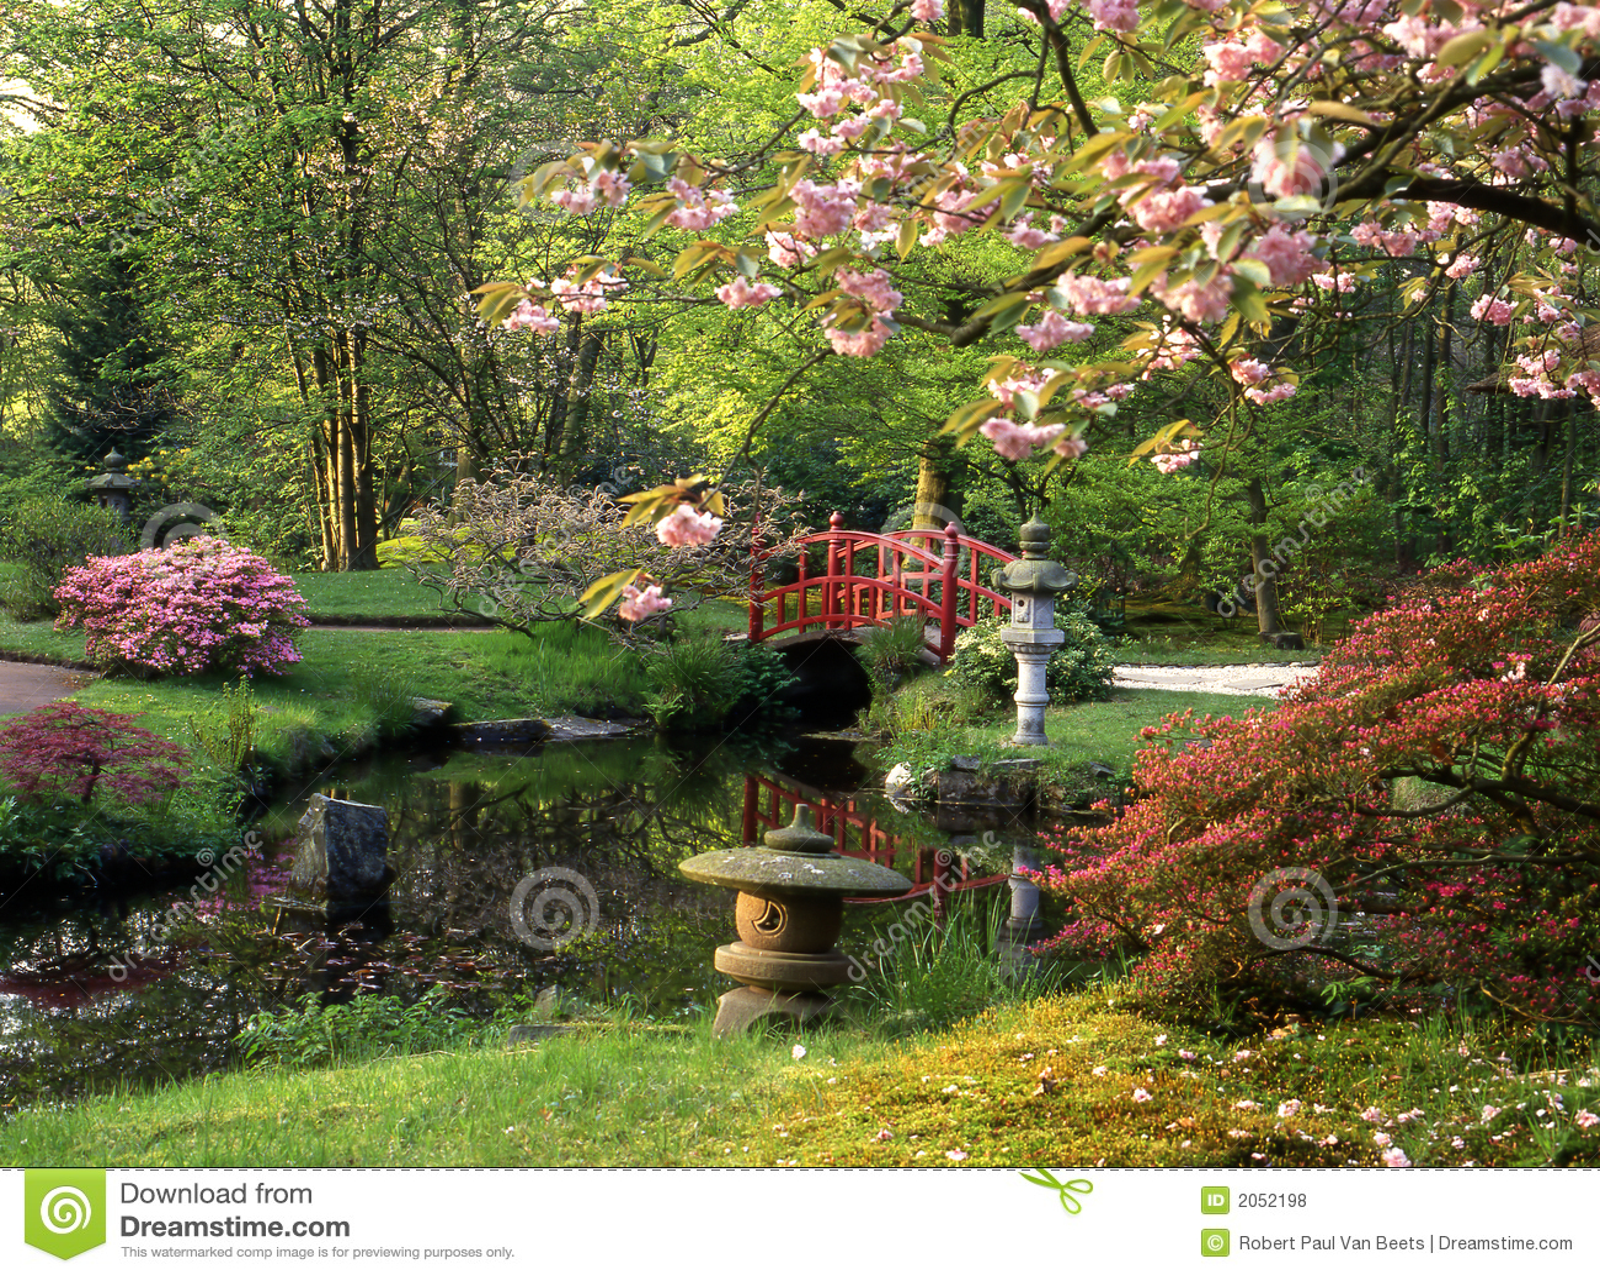 Jardim japon s foto de stock imagem de jardim flores 2052198 - Fotos jardines japoneses ...